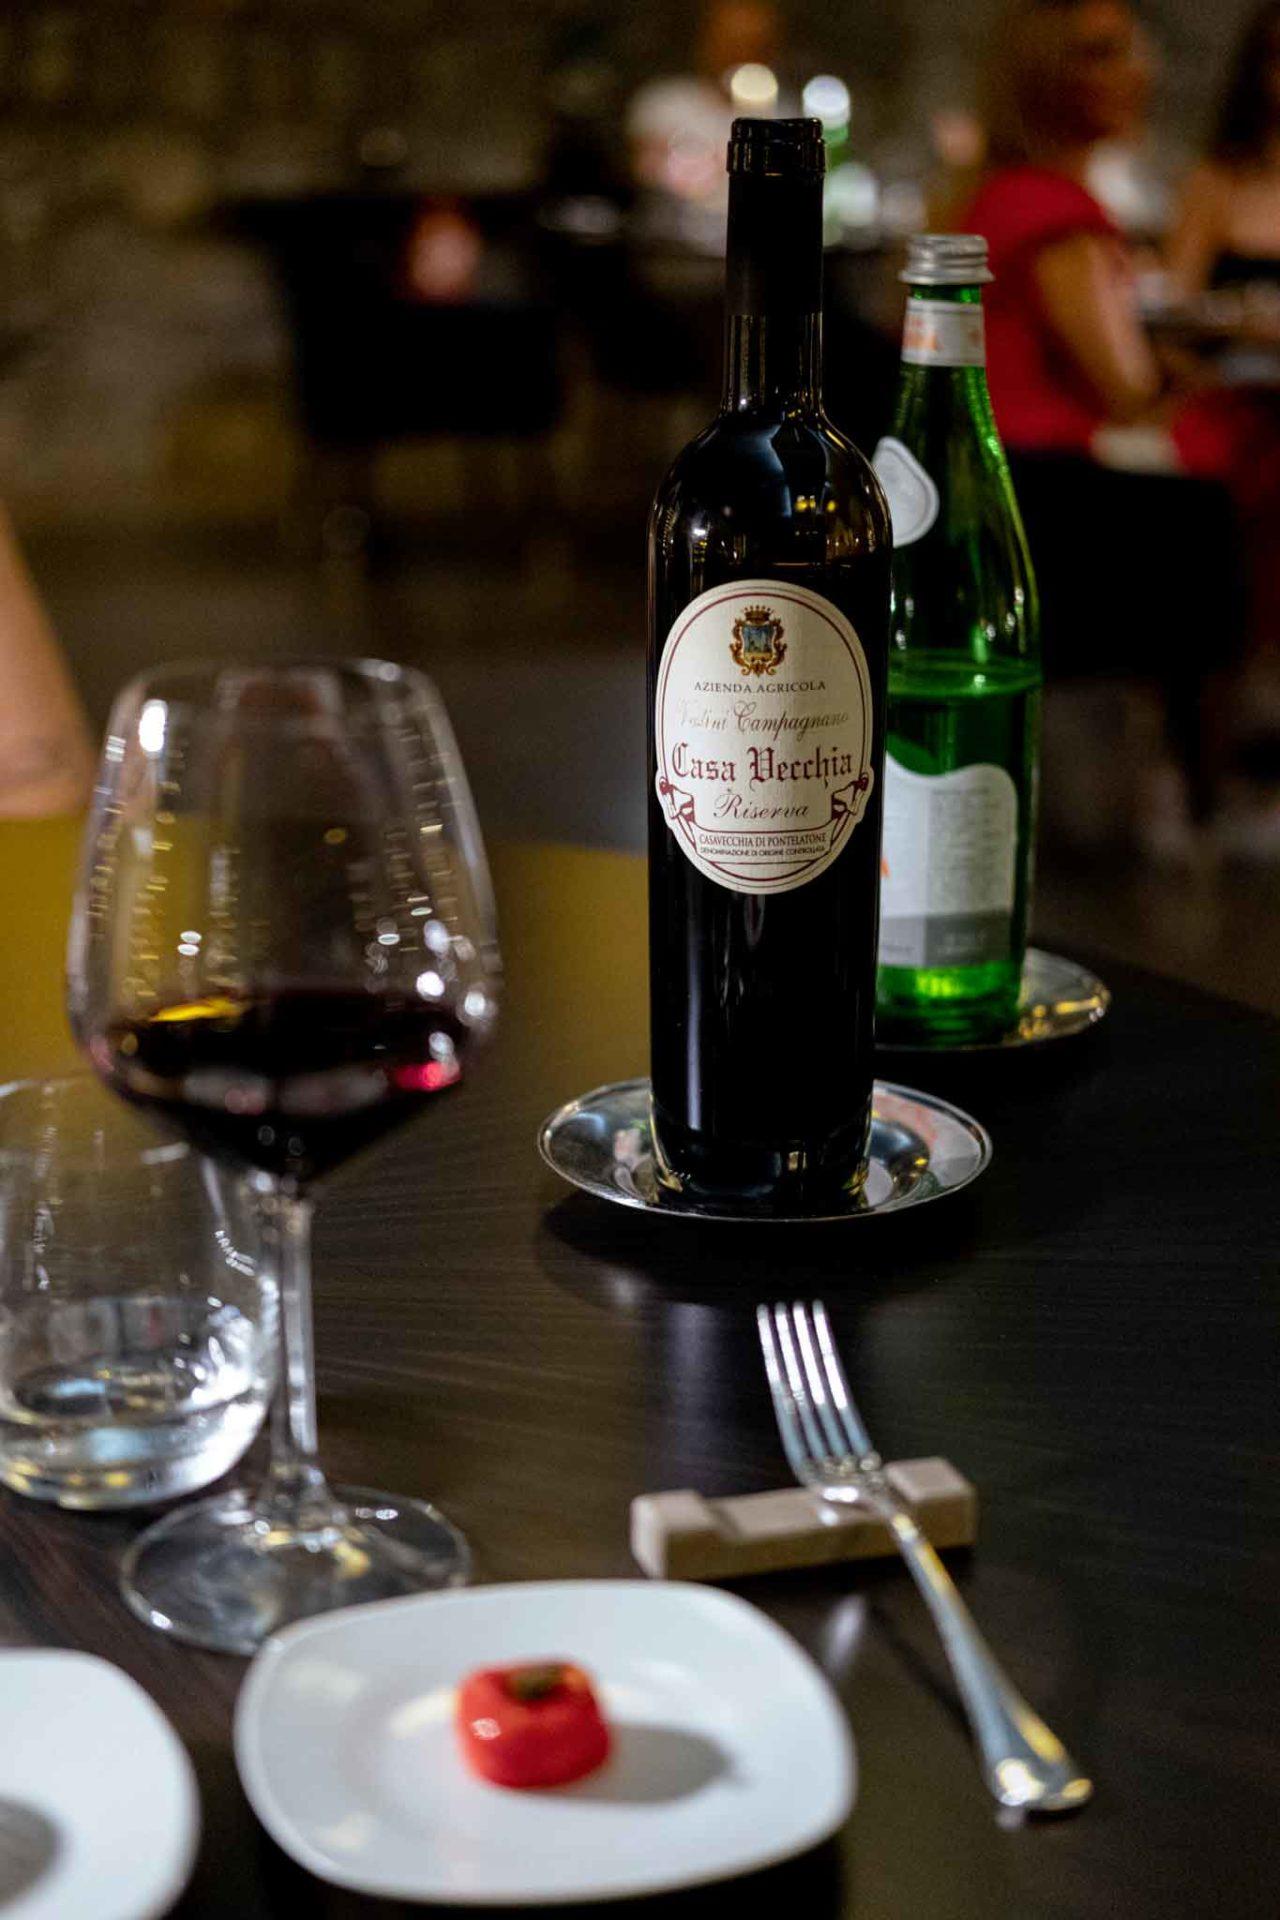 vino Casa vecchia